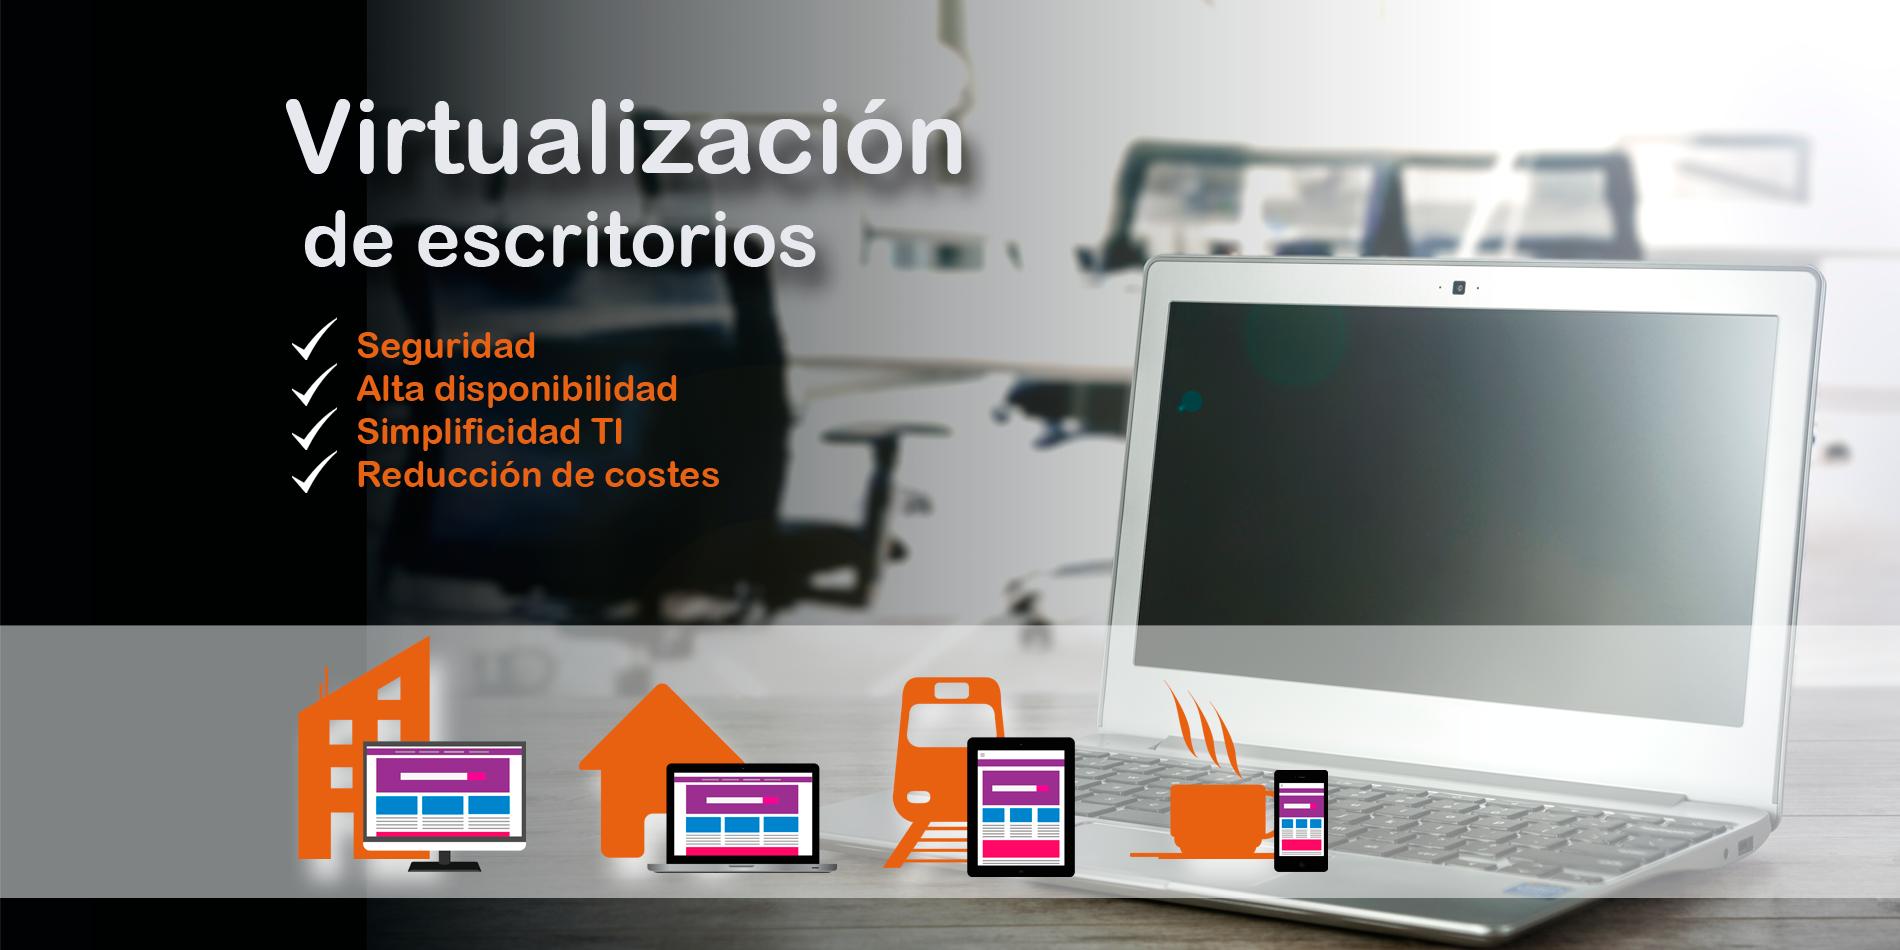 Virtualización de escritorios en Valencia - ENETIC